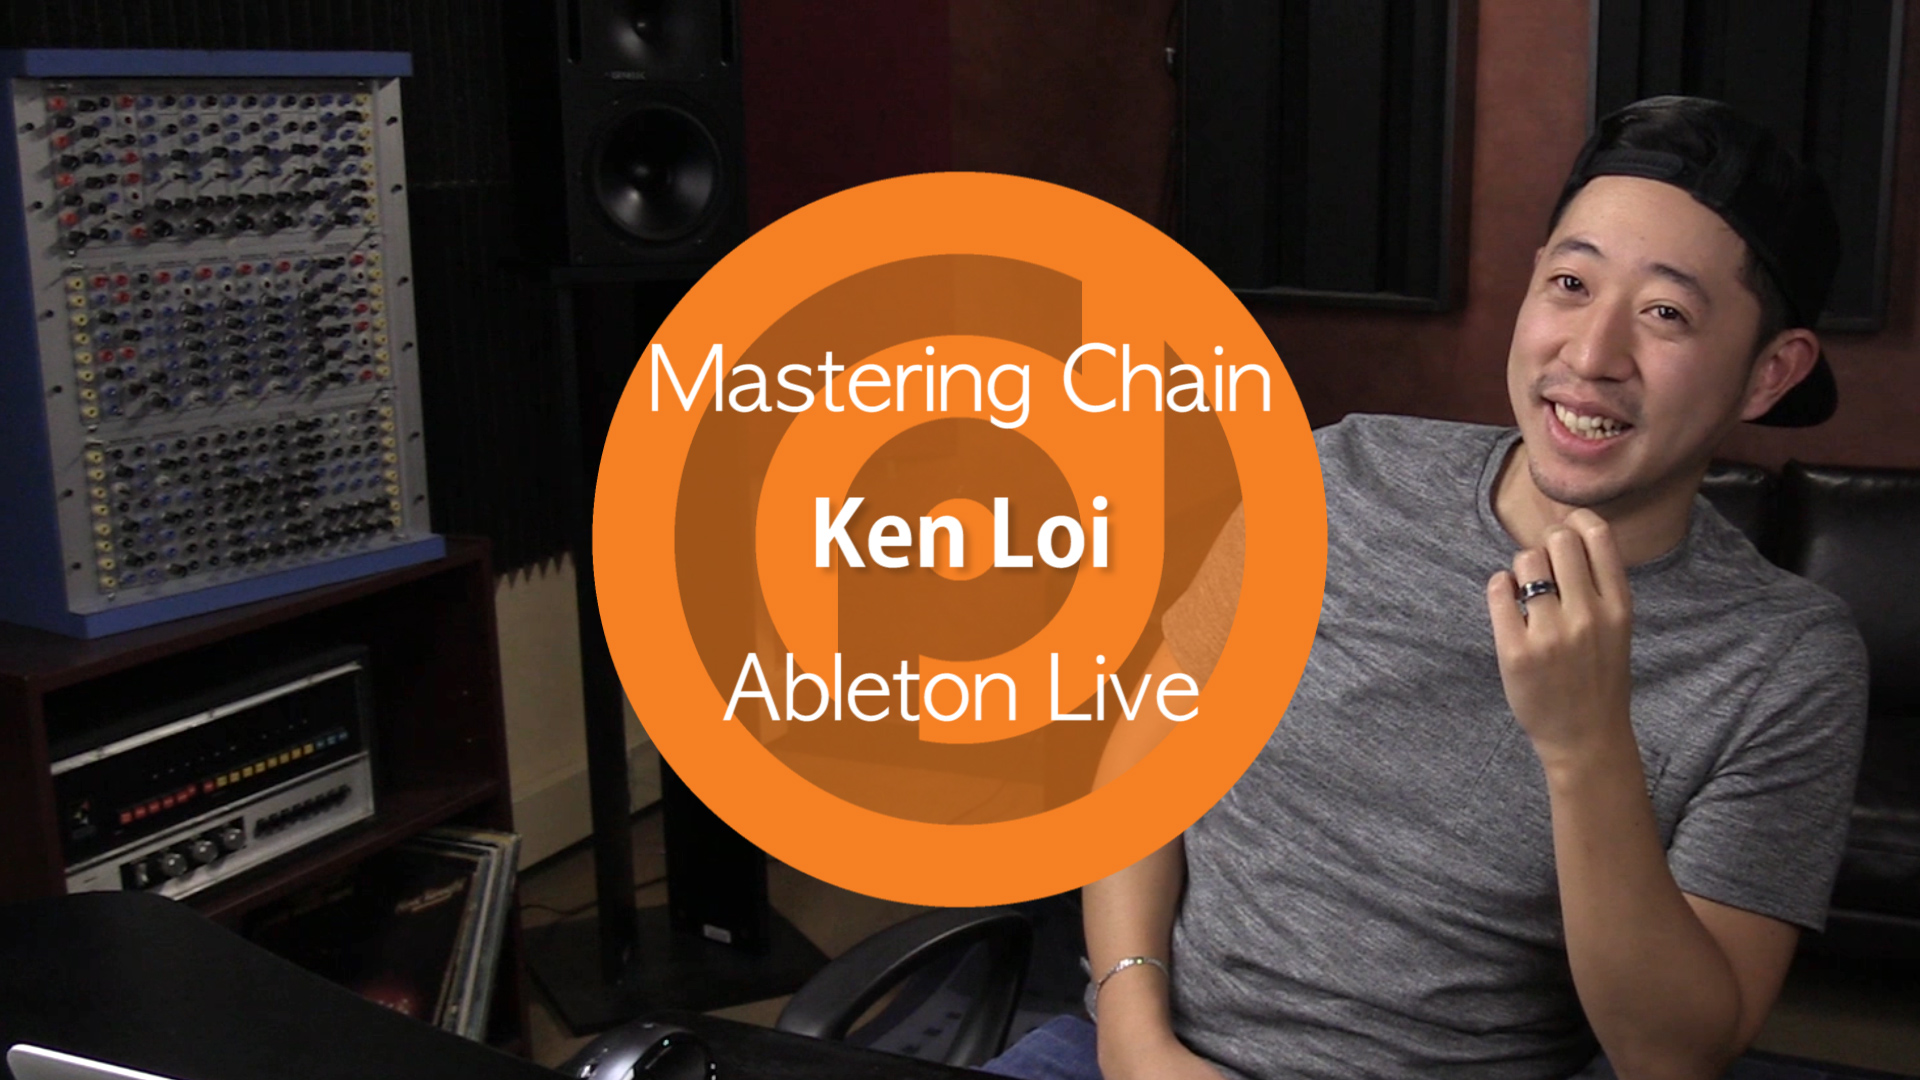 Ken Loi Mastering Chain